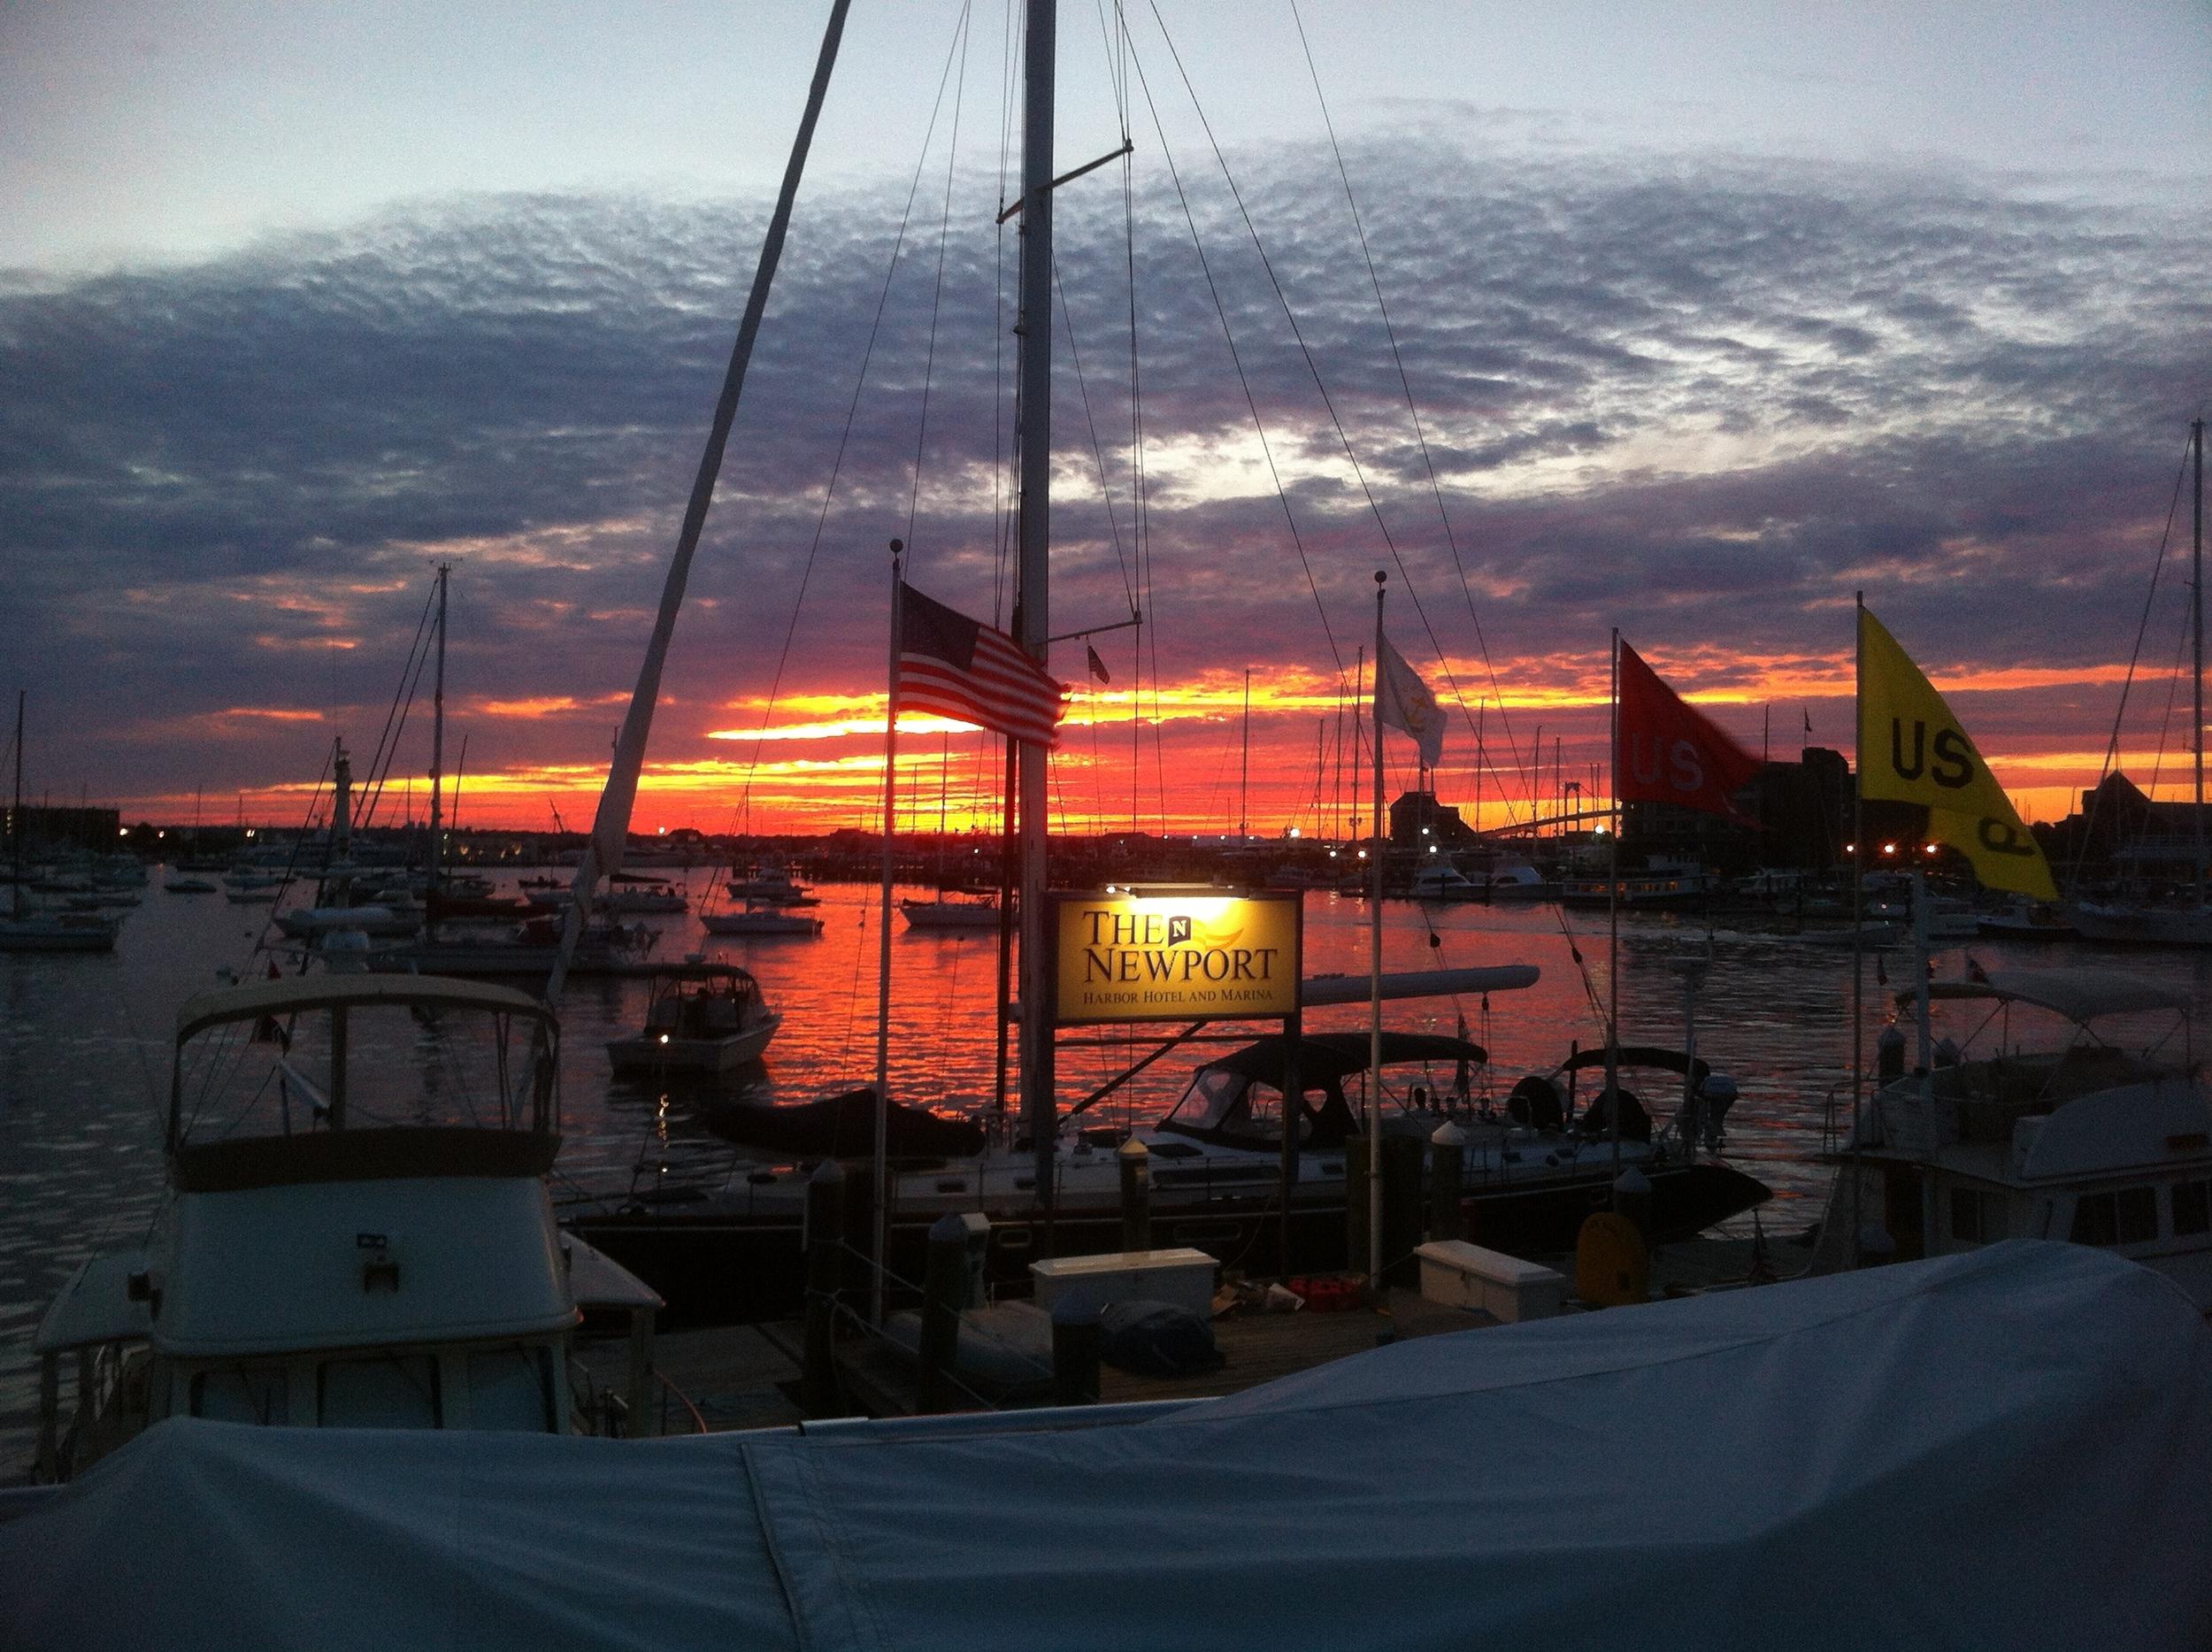 Sunset over Newport Harbor